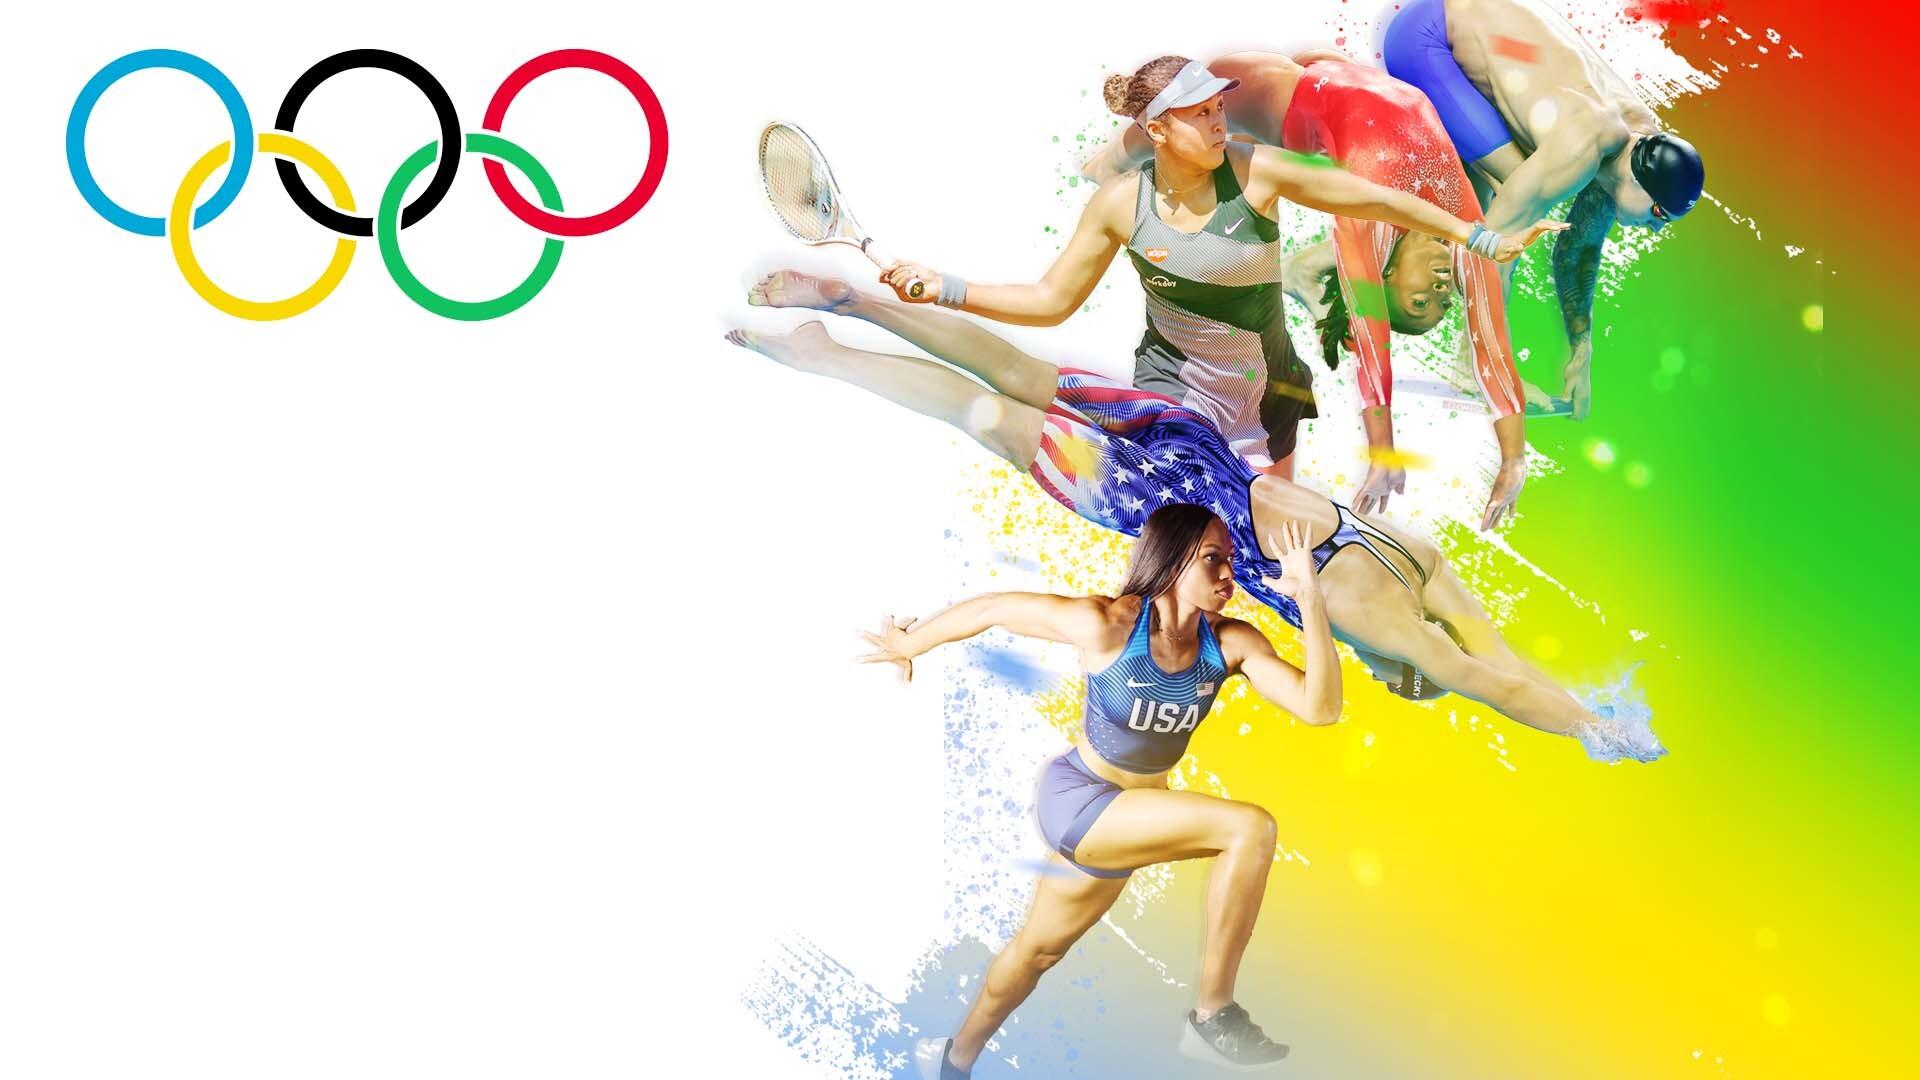 Katie Ledecky, Sunisa Lee highlight stars to watch at the Tokyo Olympics